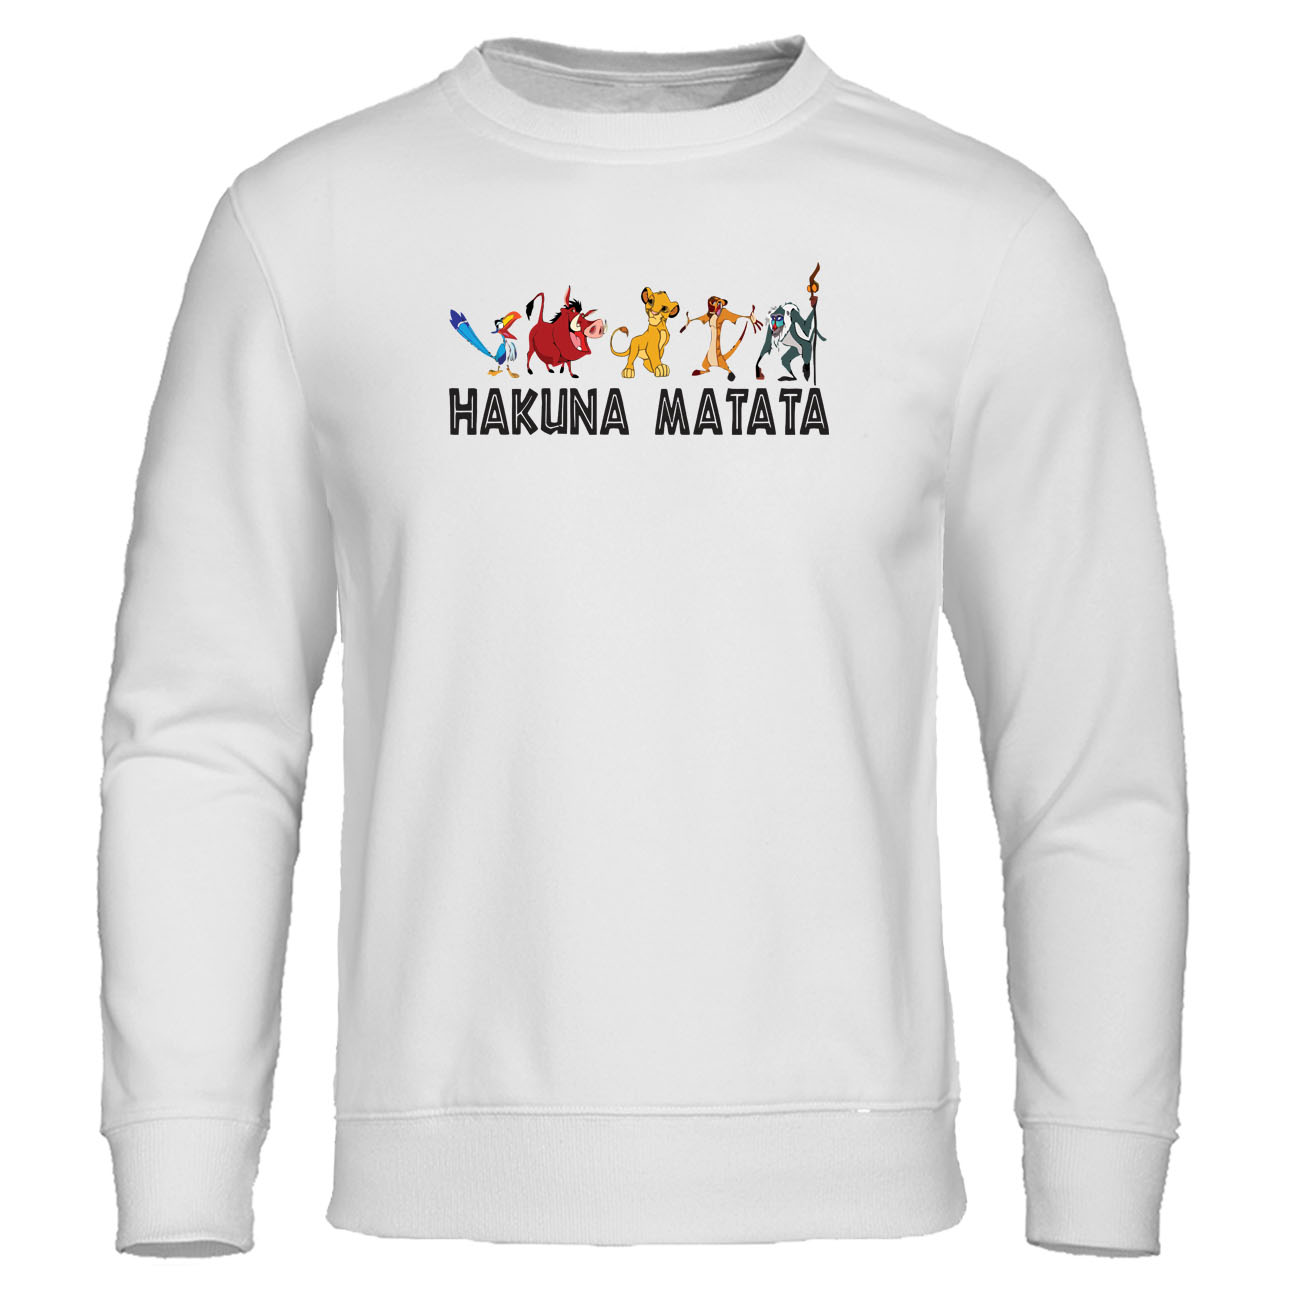 The Lion King Simba Movie Hakuna Matata Print Hoodie Sweatshirt Fashion Hot Sale Hoodies Harajuku Streetwear Autumn Men Clothes